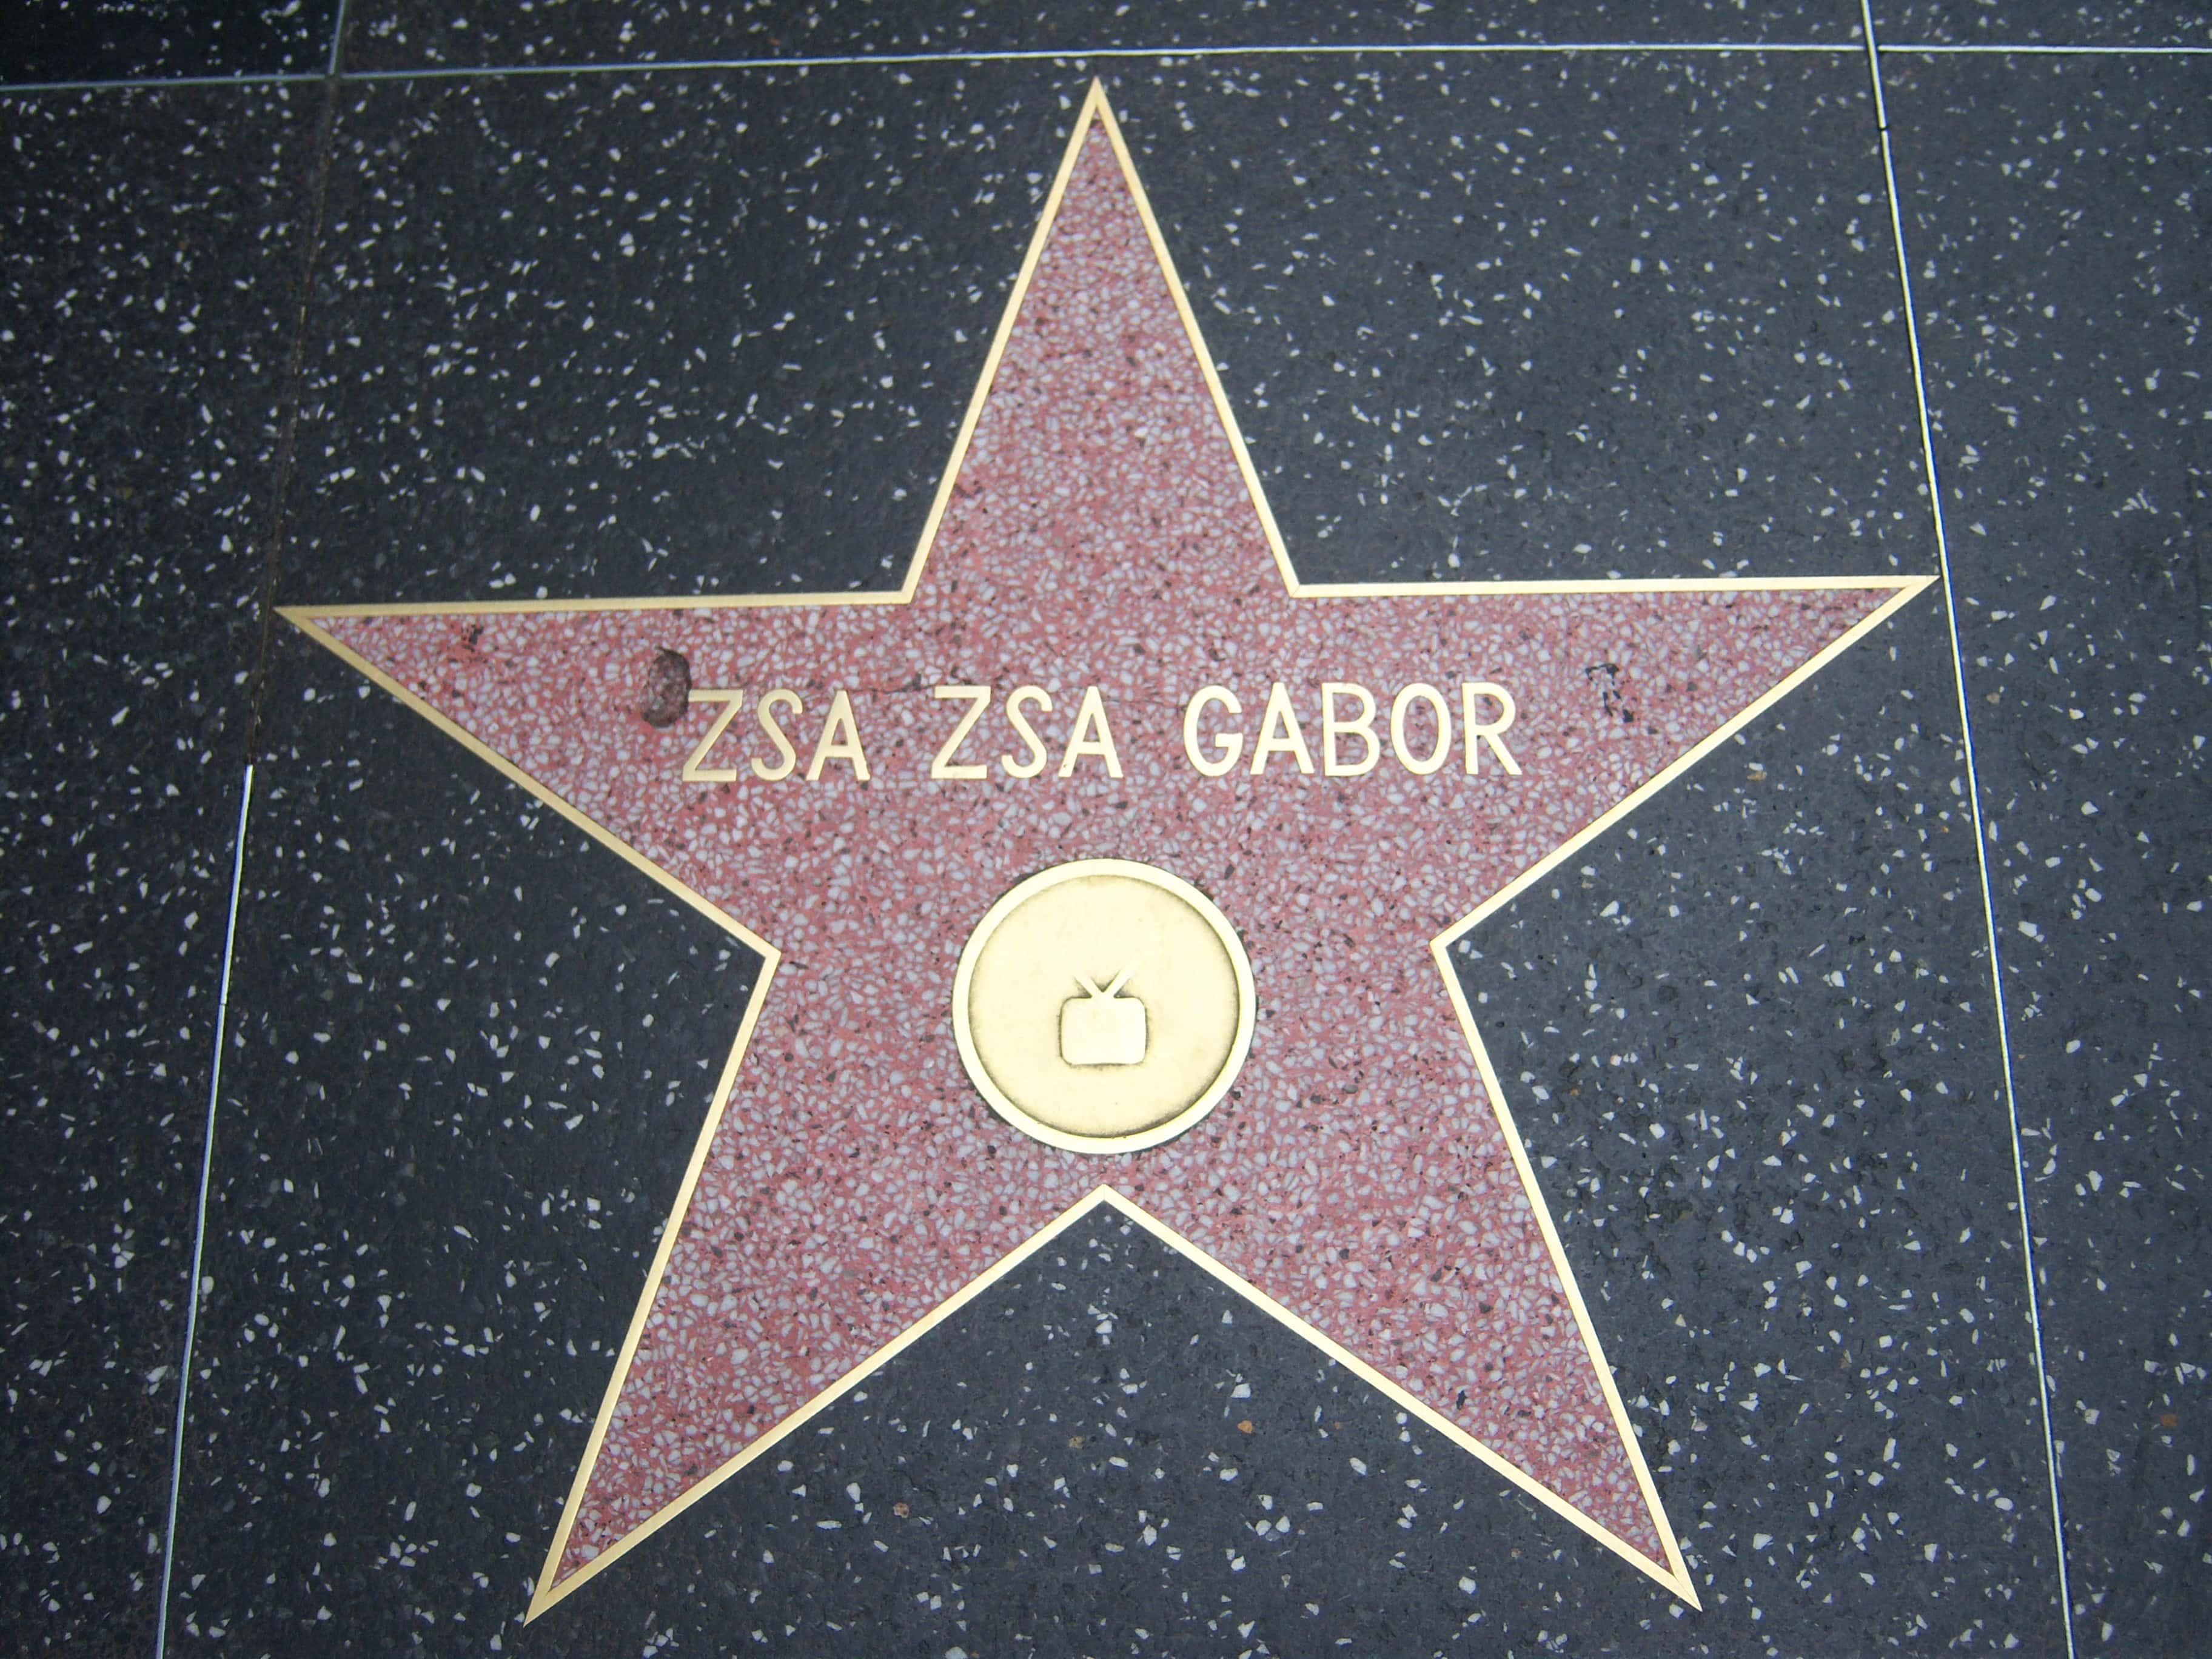 Zsa Zsa Gabor facts